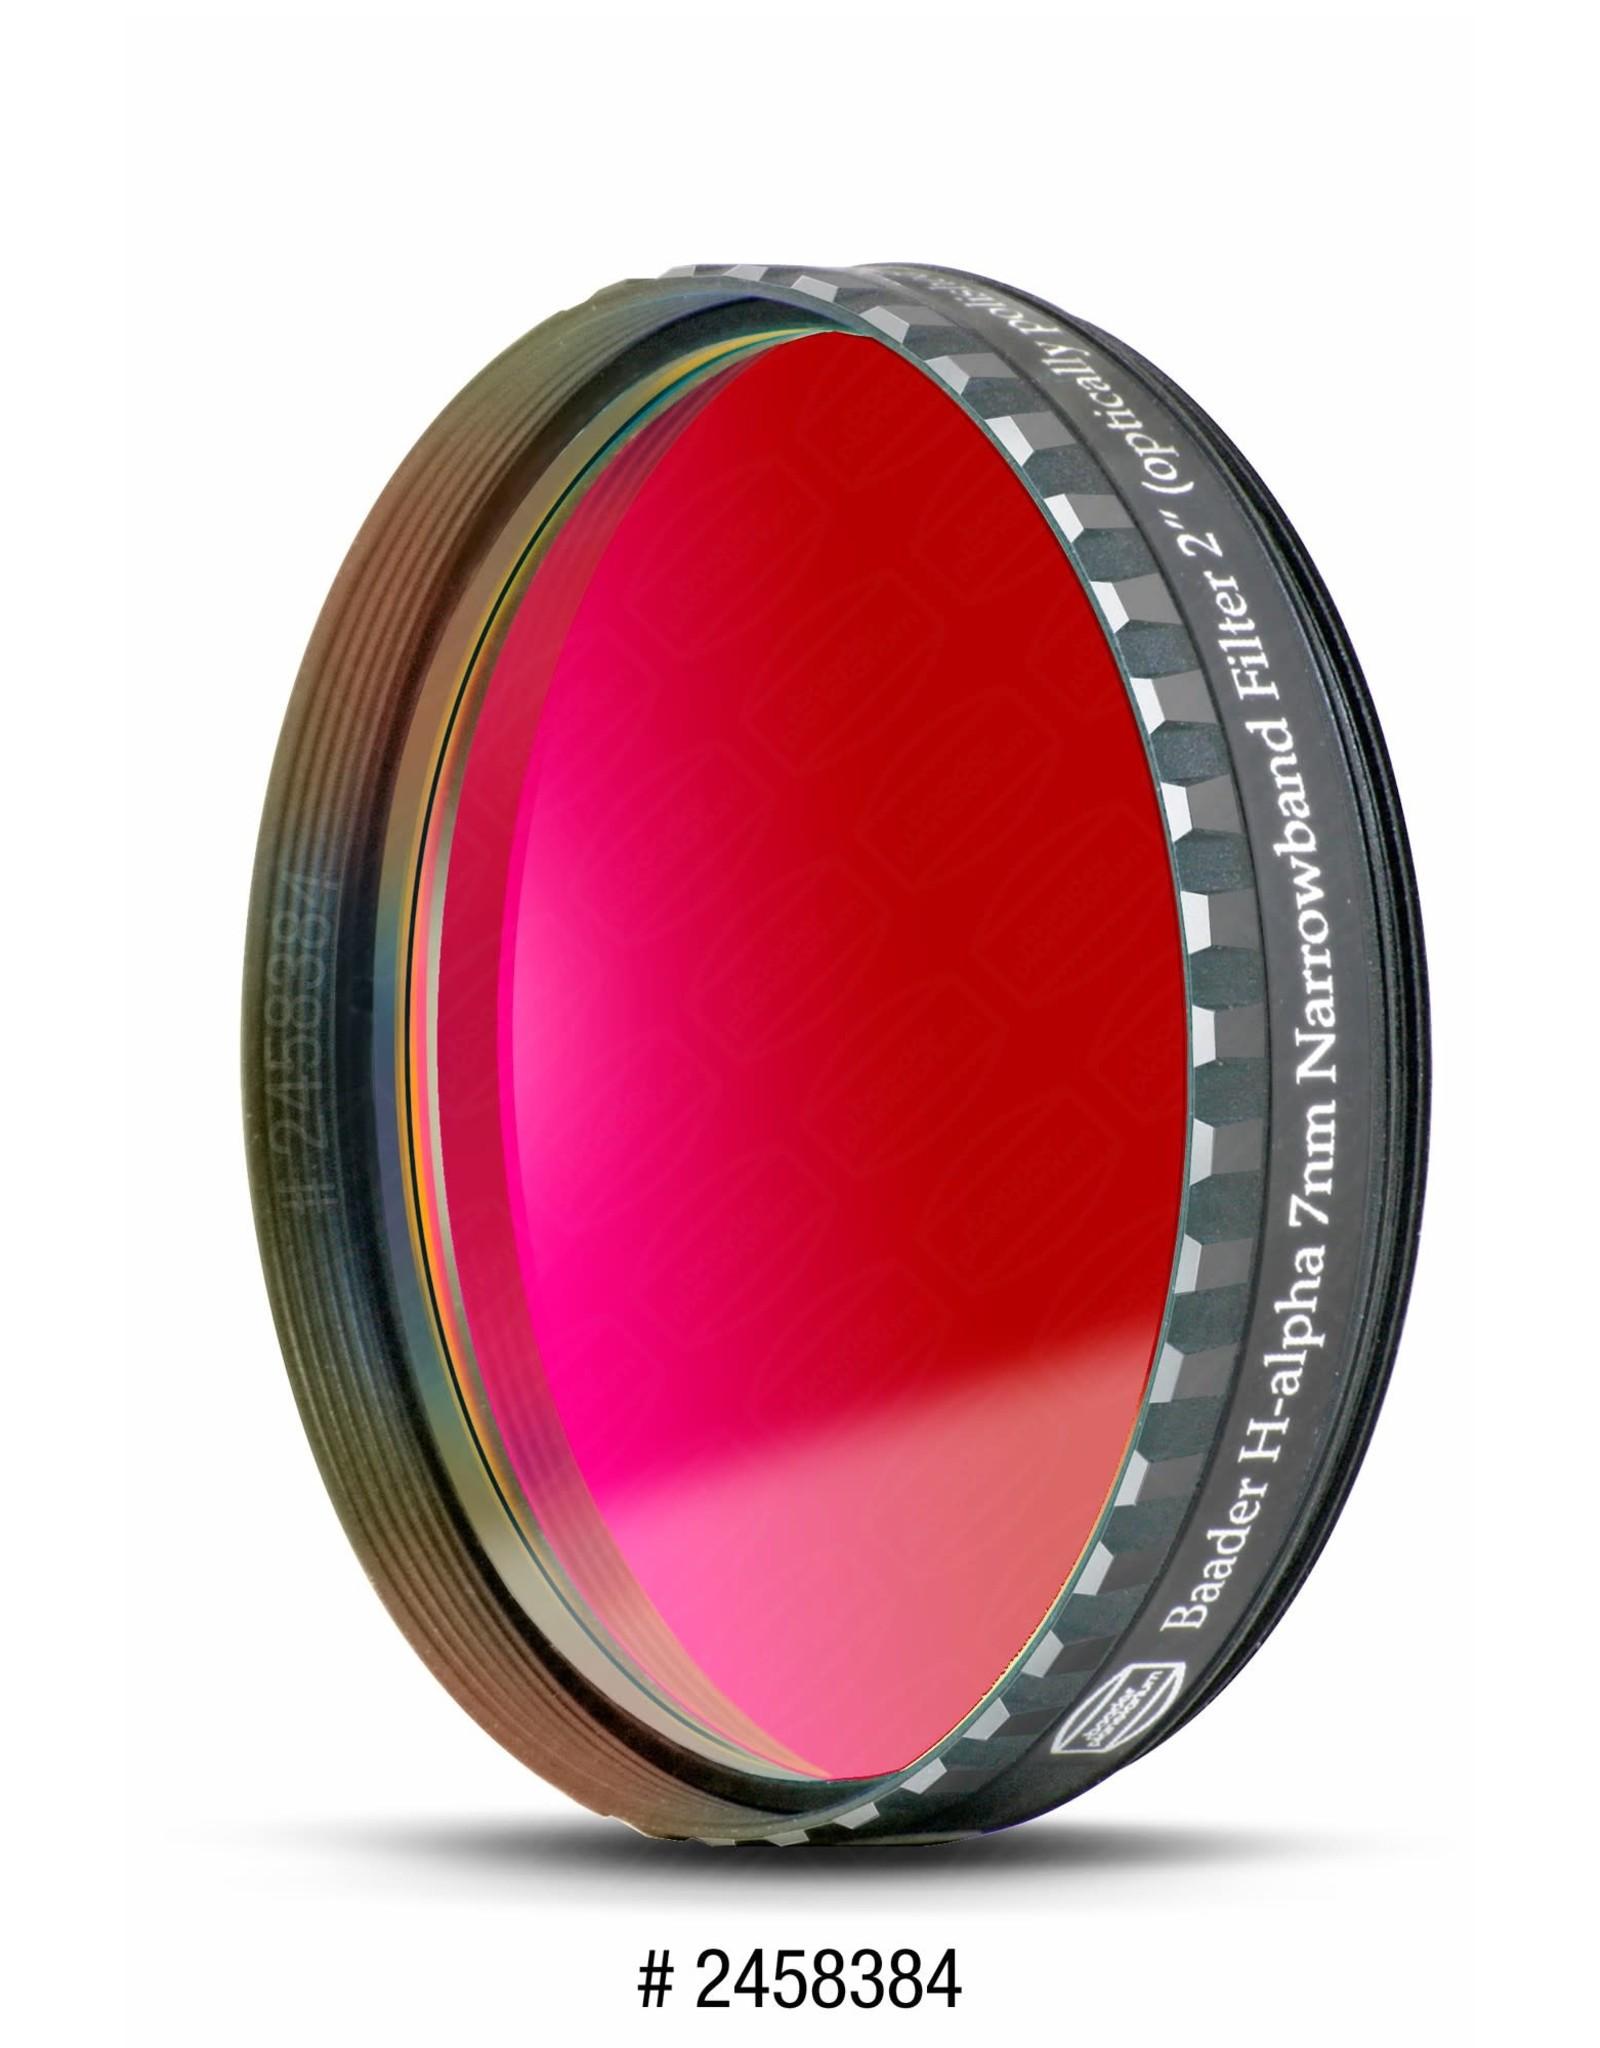 Baader Planetarium Baader Premium H-alpha 7nm CCD Narrowband-Filter (Specify Size)